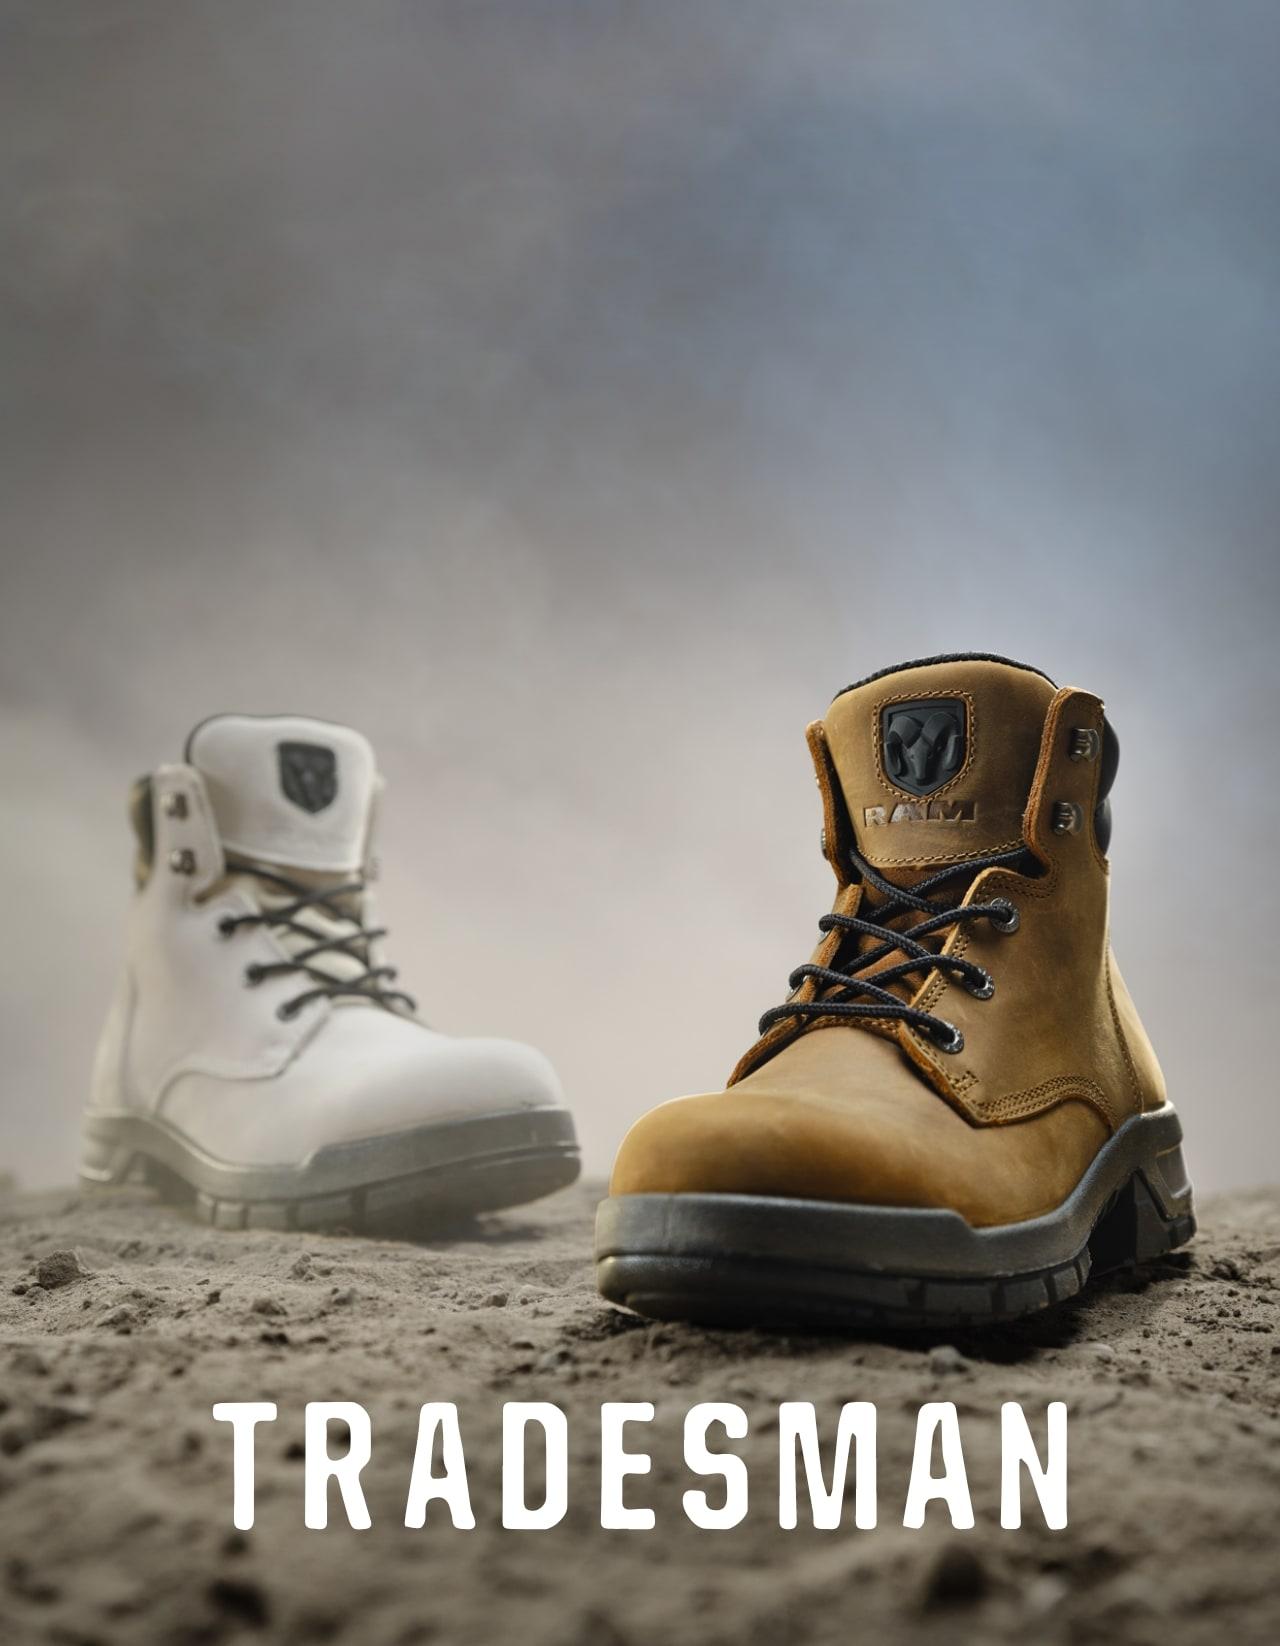 Wolverine x RAM collab Tradesman.